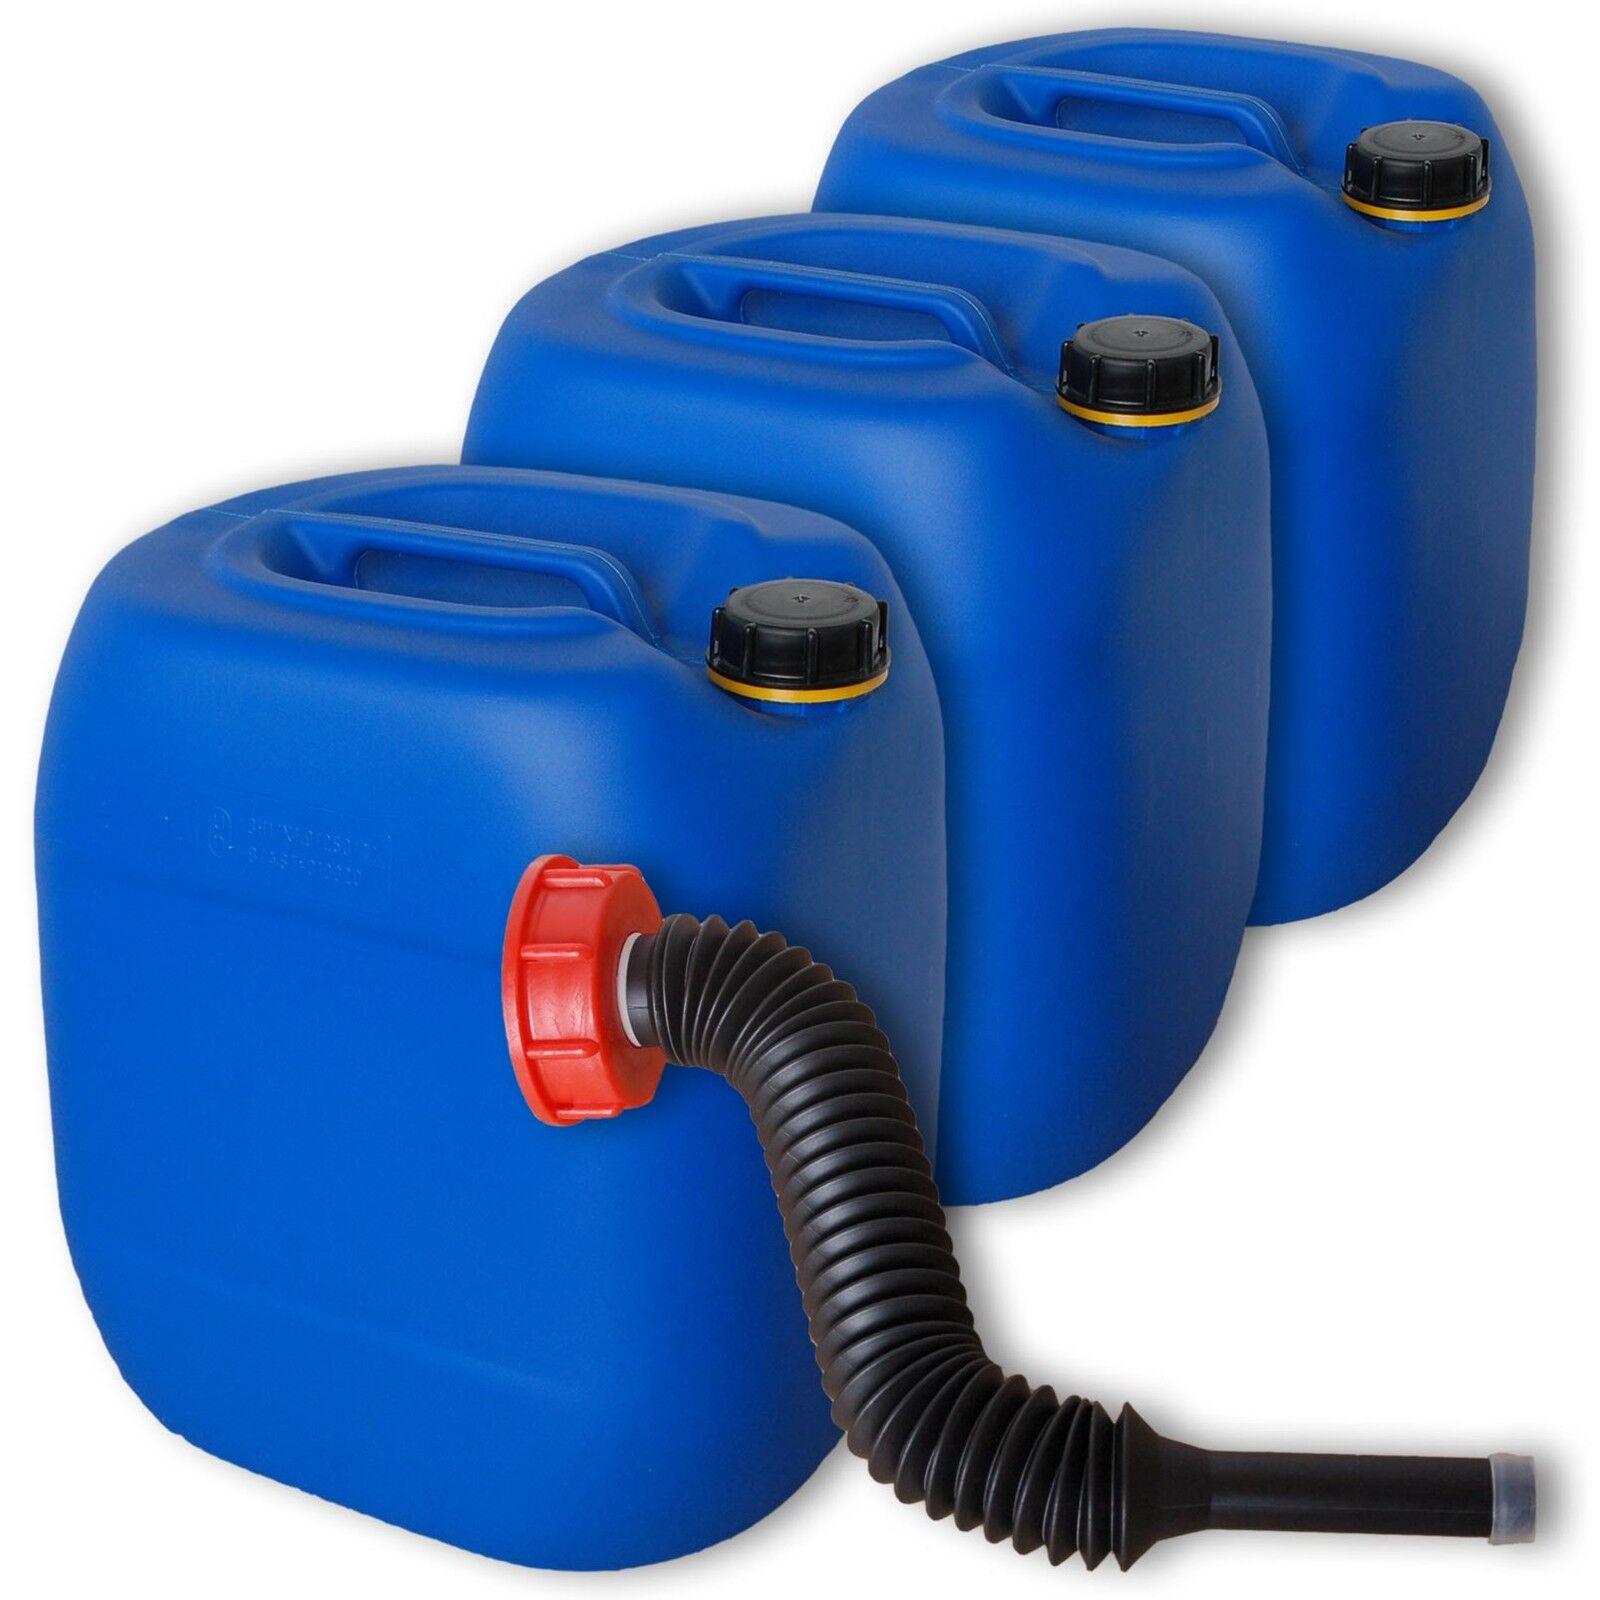 Bidon plastique 30 L Bleu DIN 61+1 Long verseur Bec verseur Long flexible PEHD (22027+037) 45dcdc